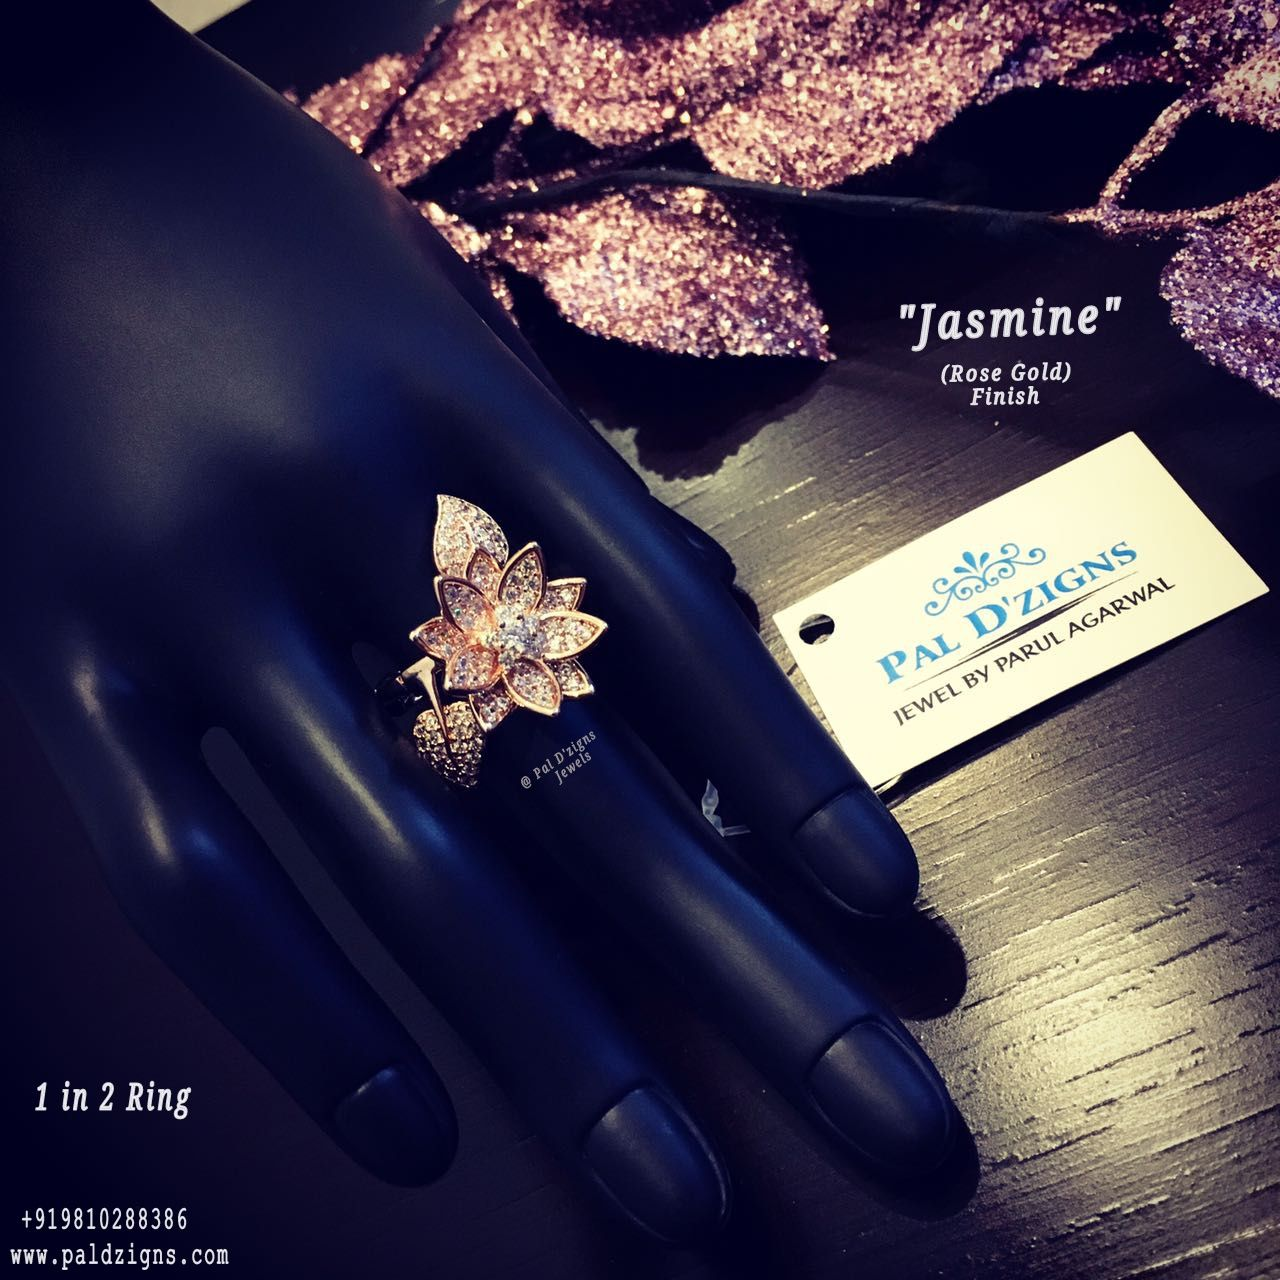 Jasmine Rose Gold Ring